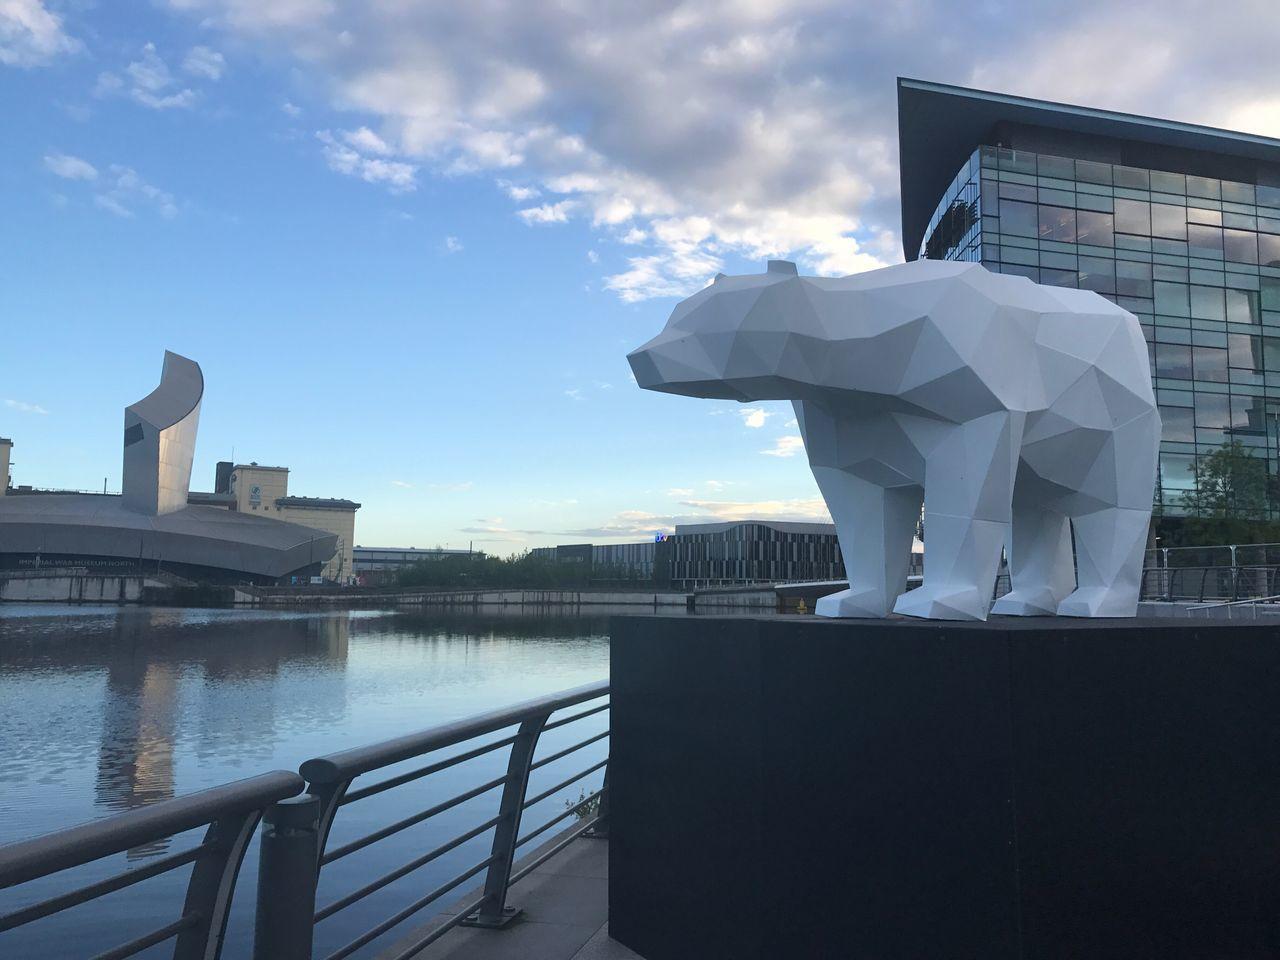 Sky Architecture Outdoors Cloud - Sky Sculpture Modern Polar Bear Mediacityuk Unnaturalborders